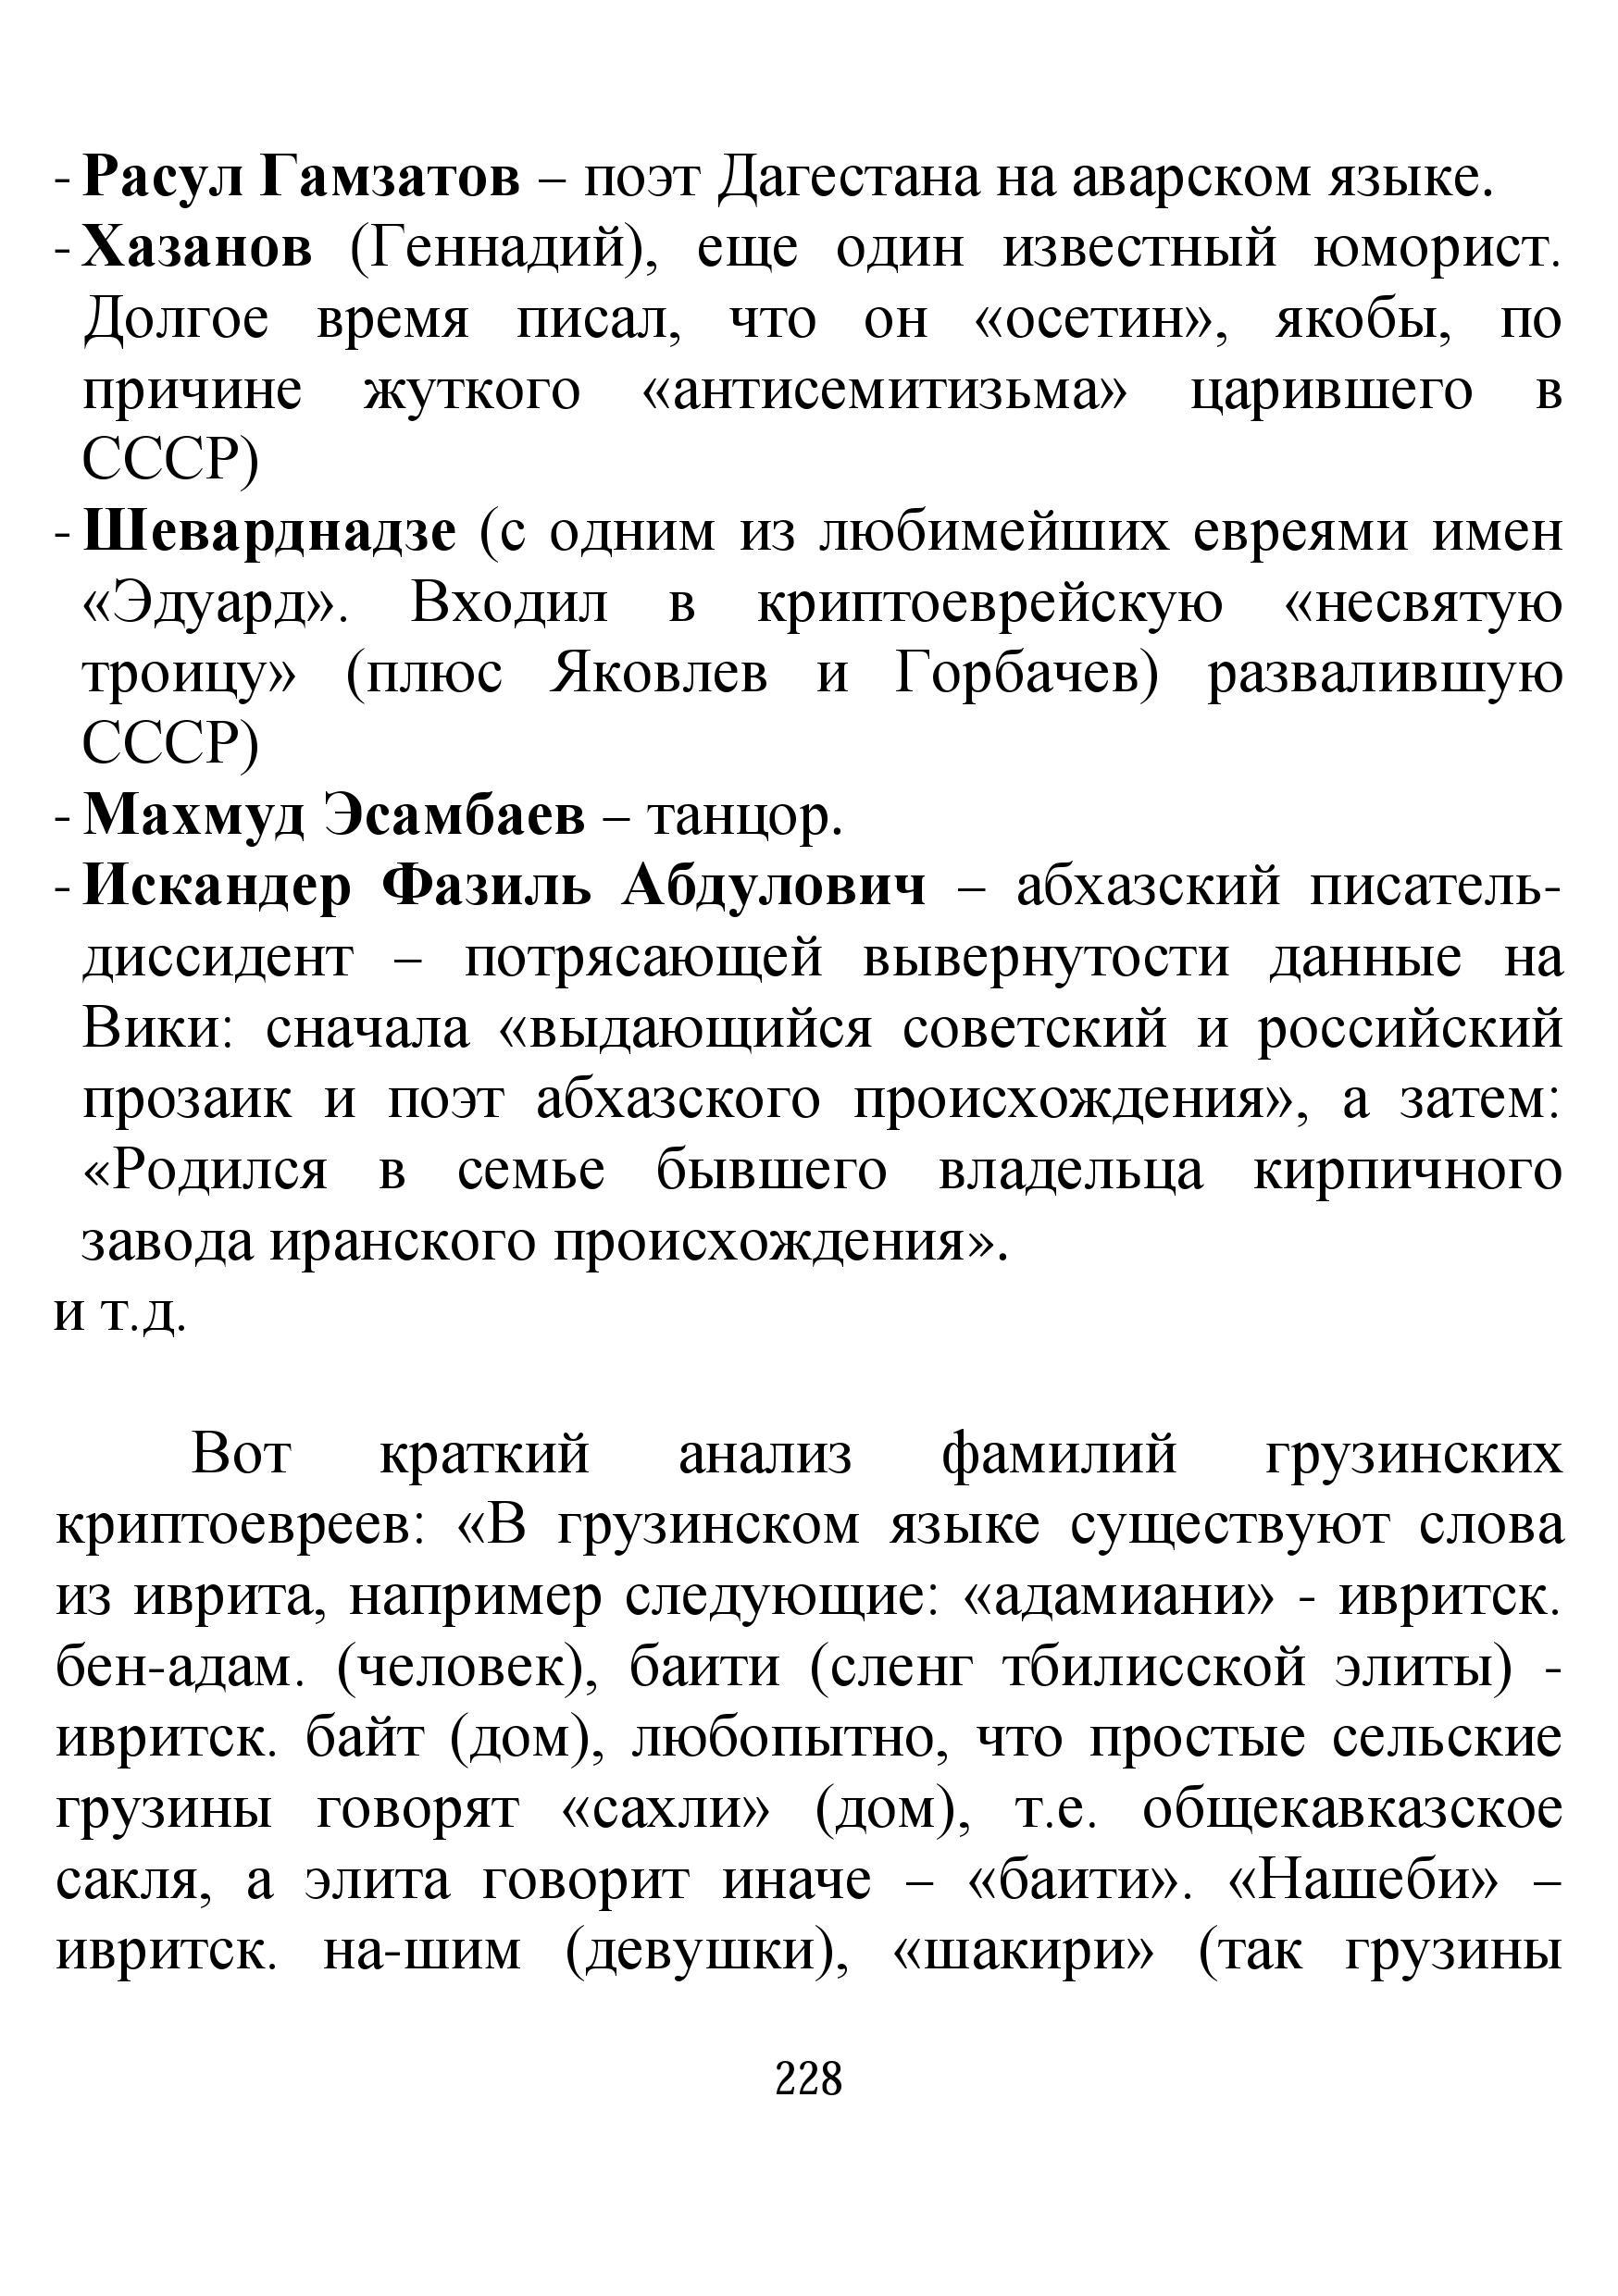 http://s2.uploads.ru/FnTYO.jpg